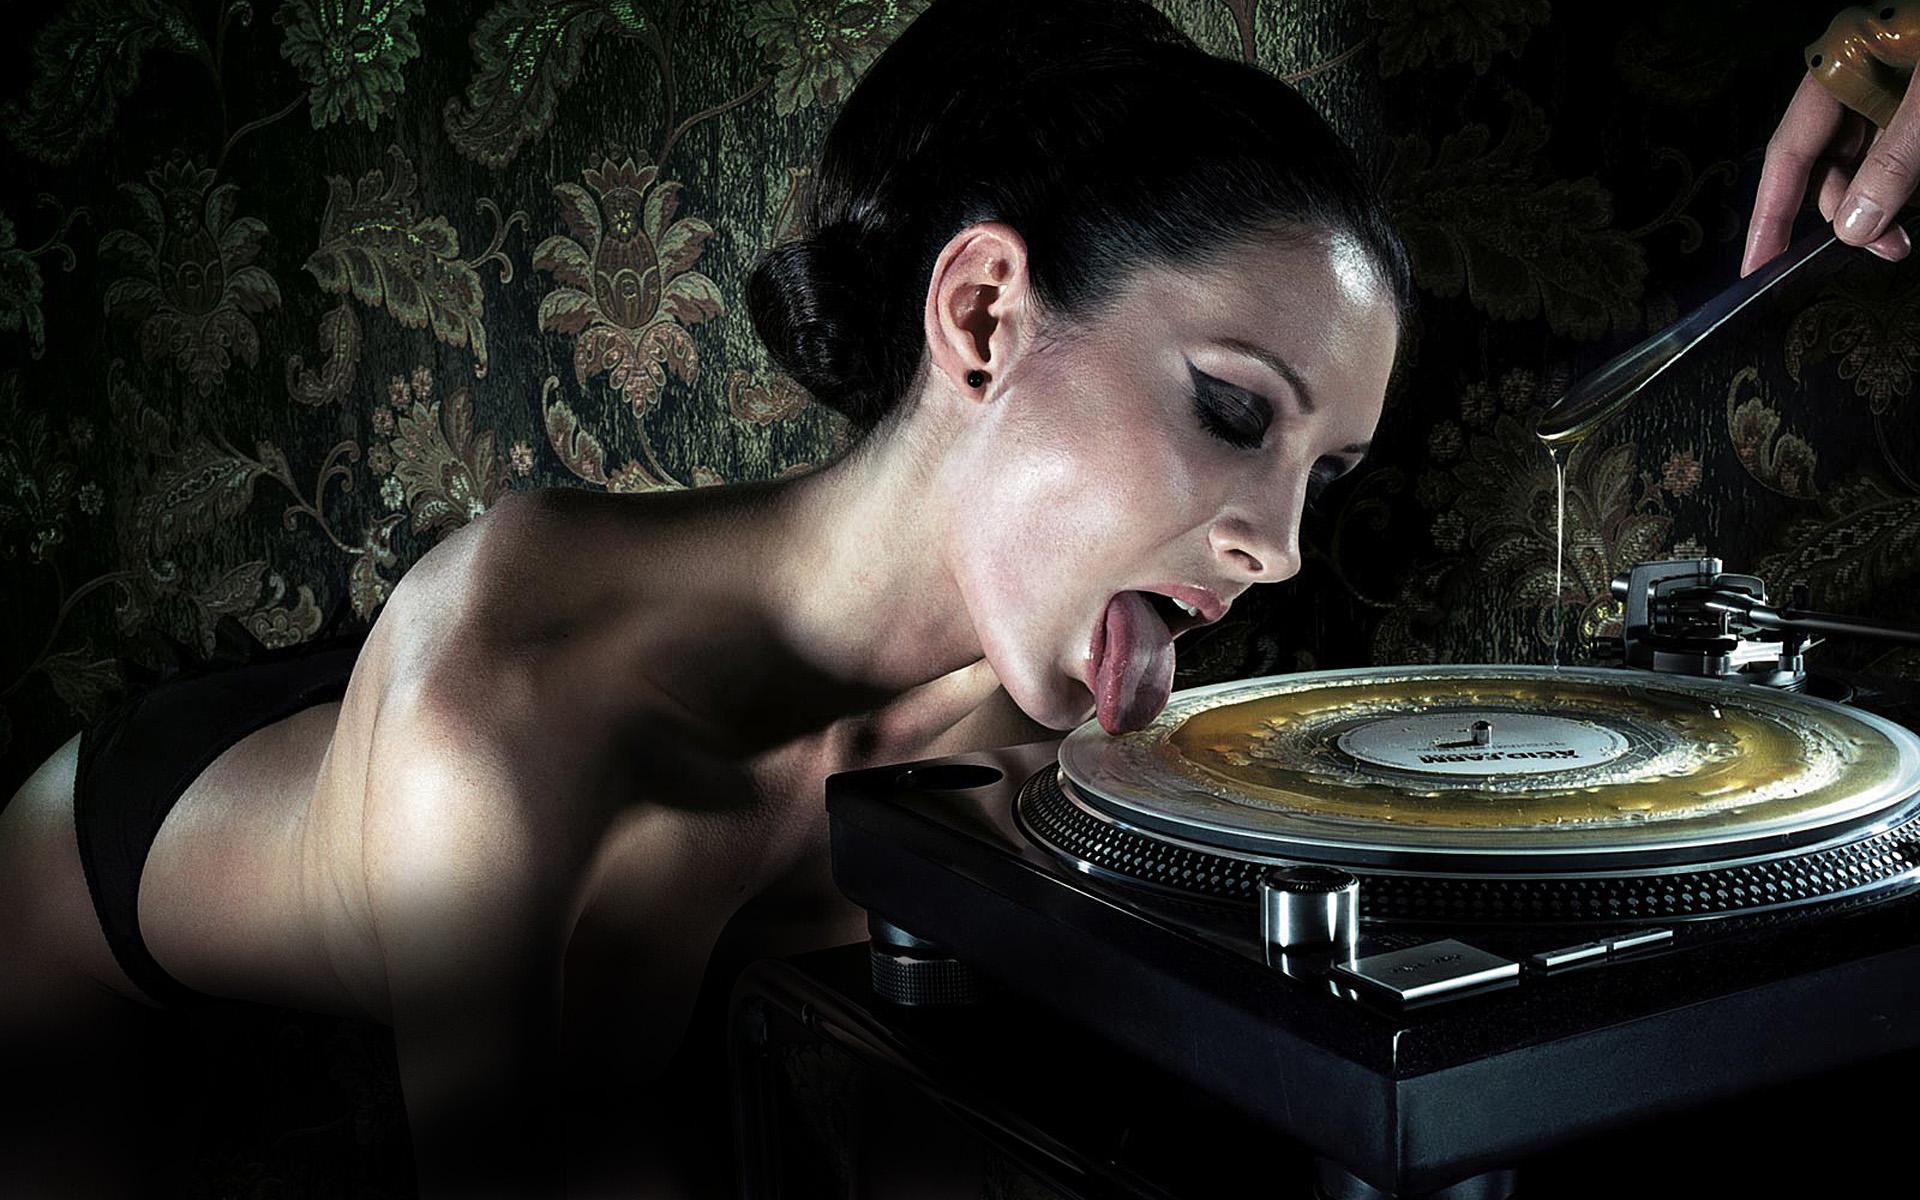 smotret-klassnuyu-erotiku-muzika-klipi